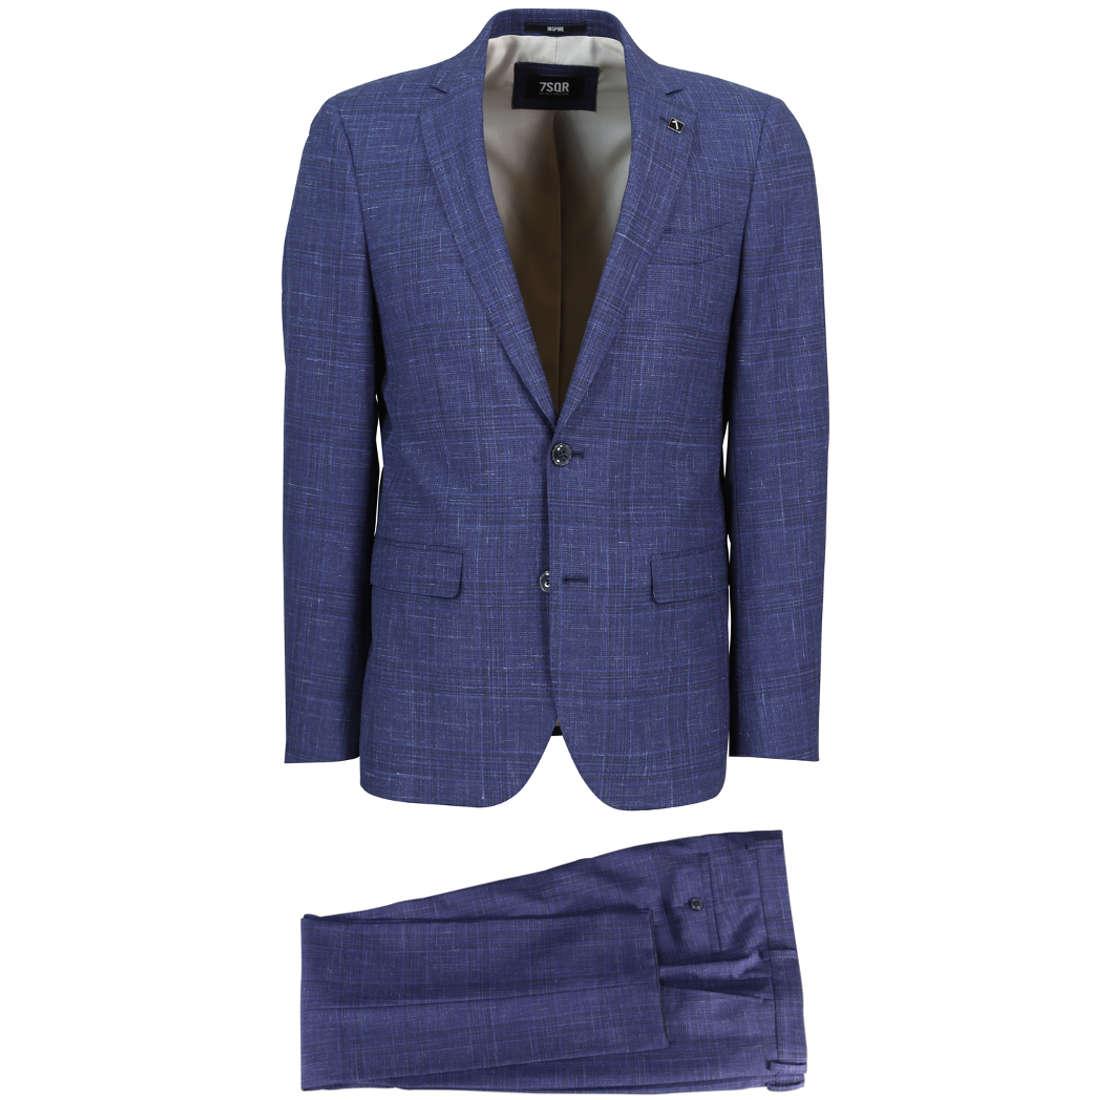 Smit Mode:  7Square kostuum 21026802 213004 in het Blauw